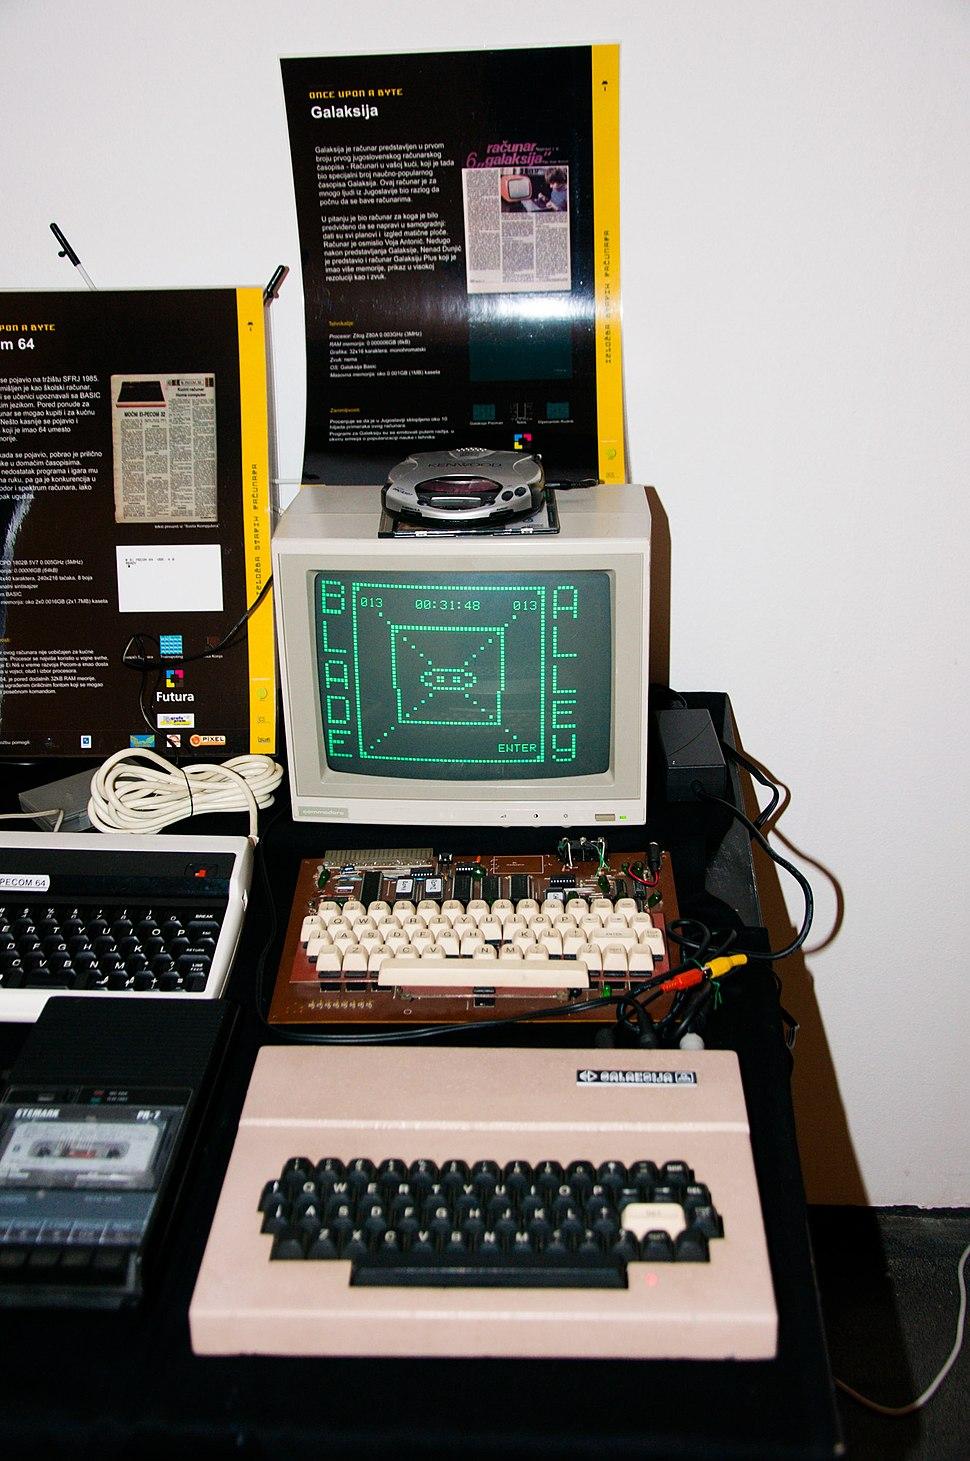 Galaksija home computer